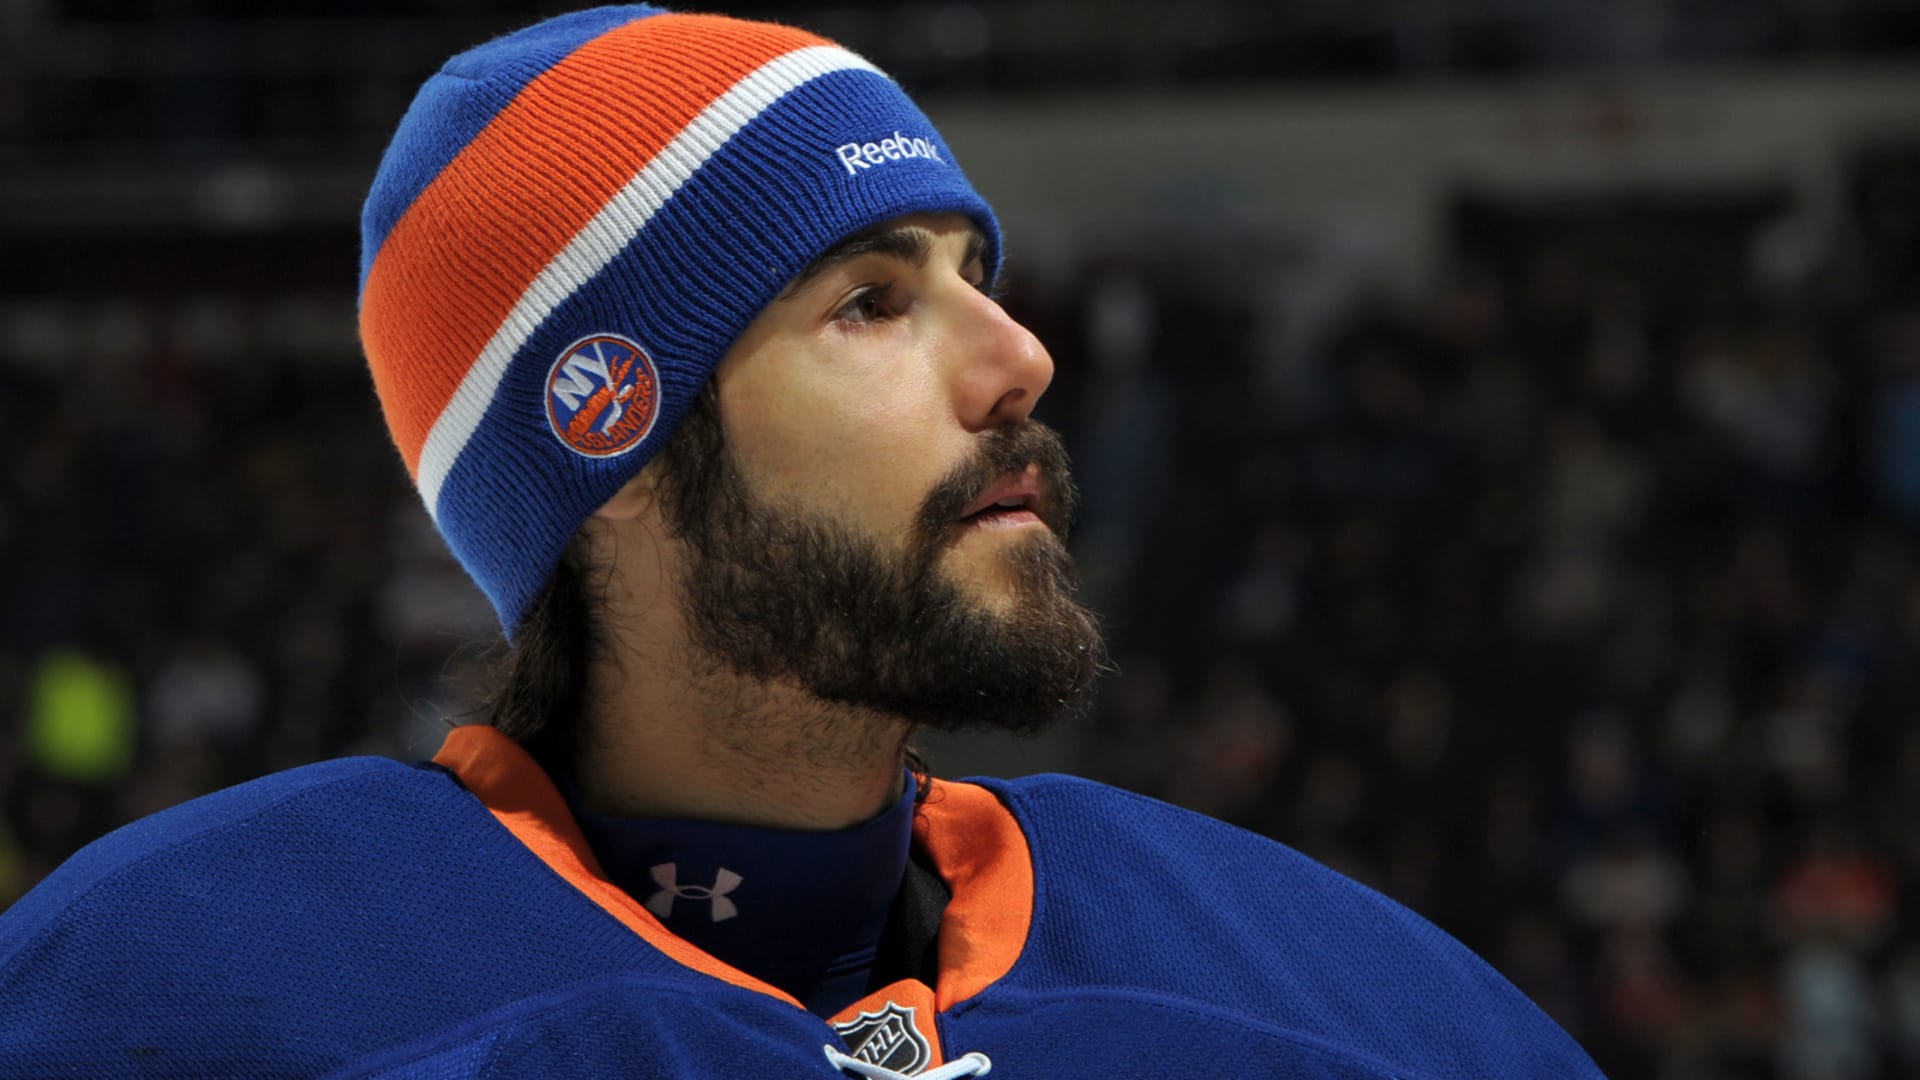 Islanders: Best Player To Wear Number 39